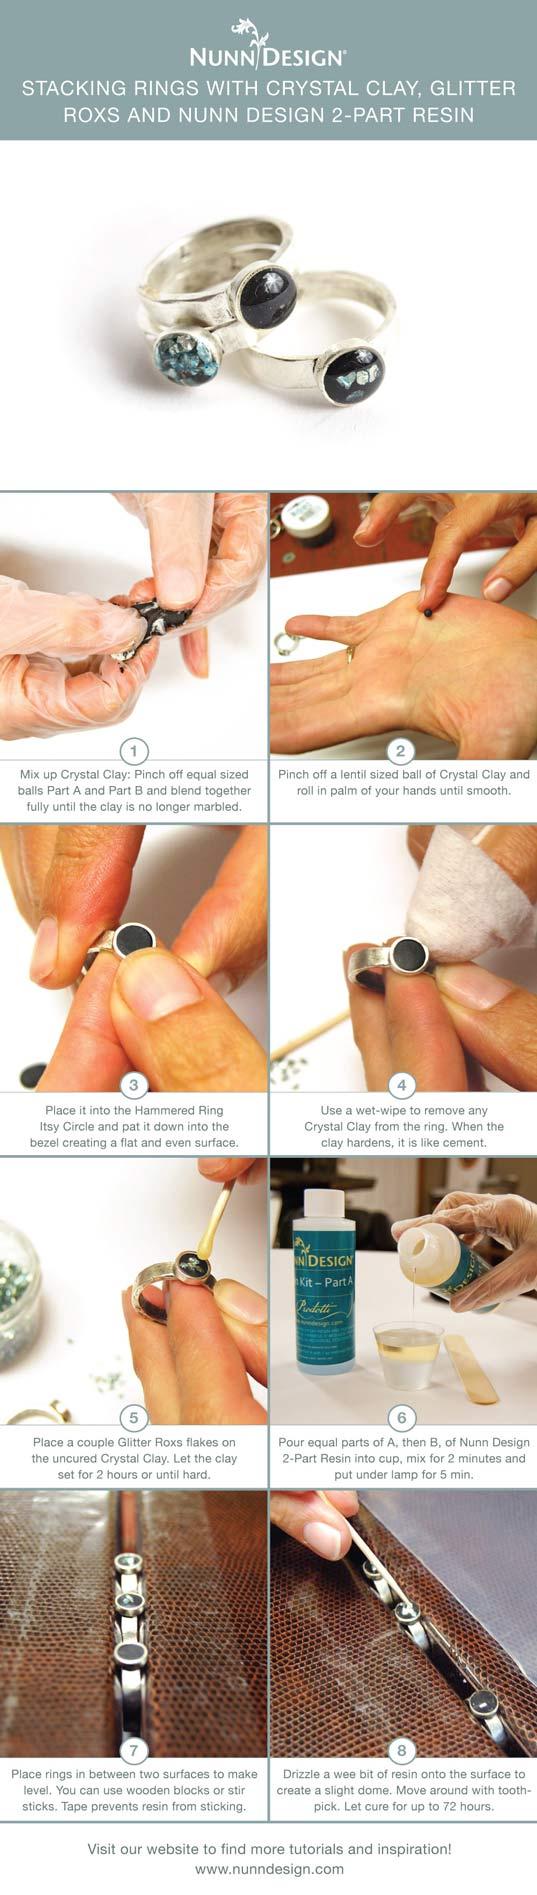 Cheatsheet-clay-resin-glitter-roxs-rings-537